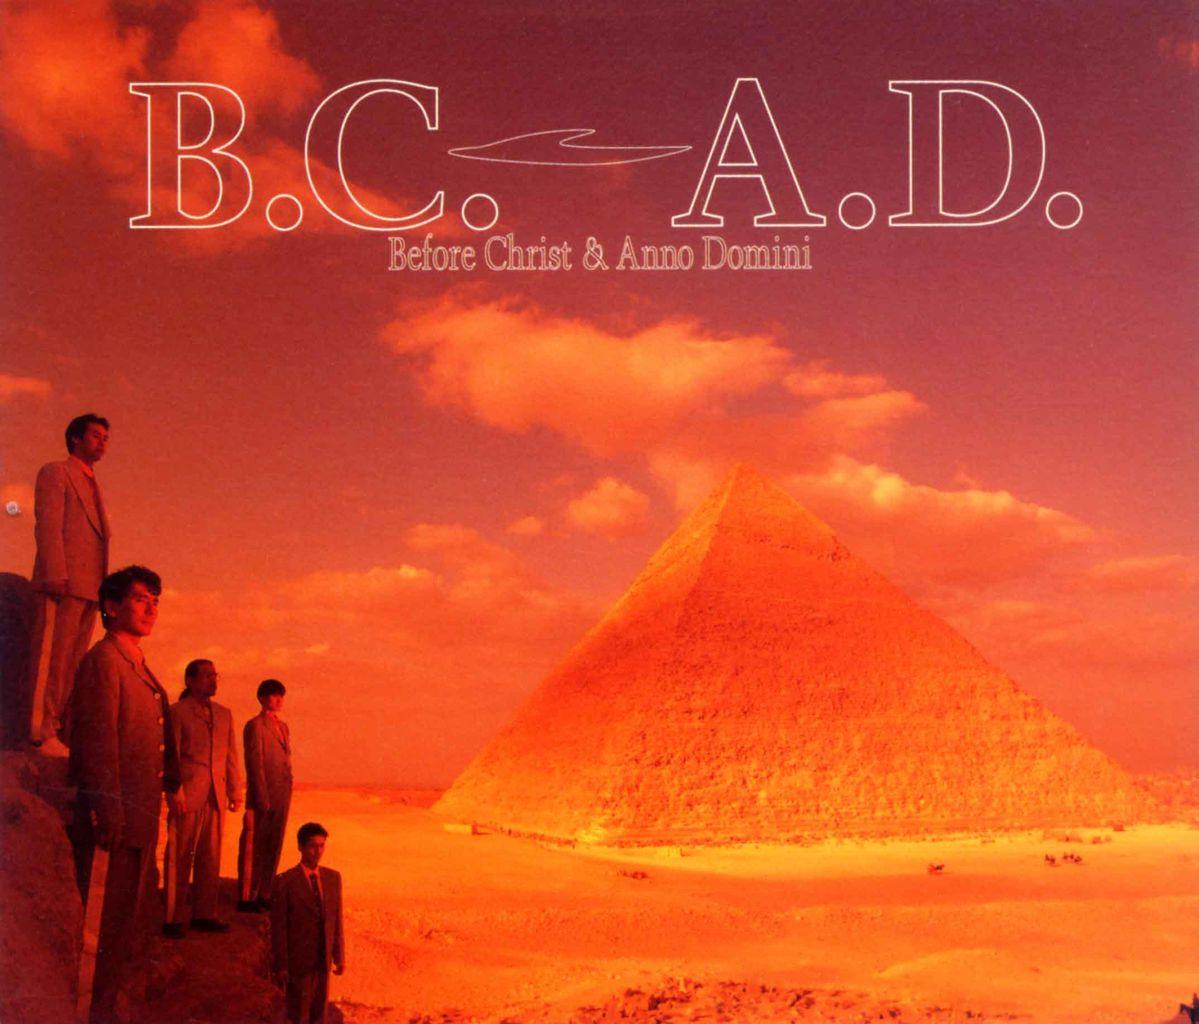 B.C. A.D.(BEFORE CHRIST & ANNO DOMINI)-1